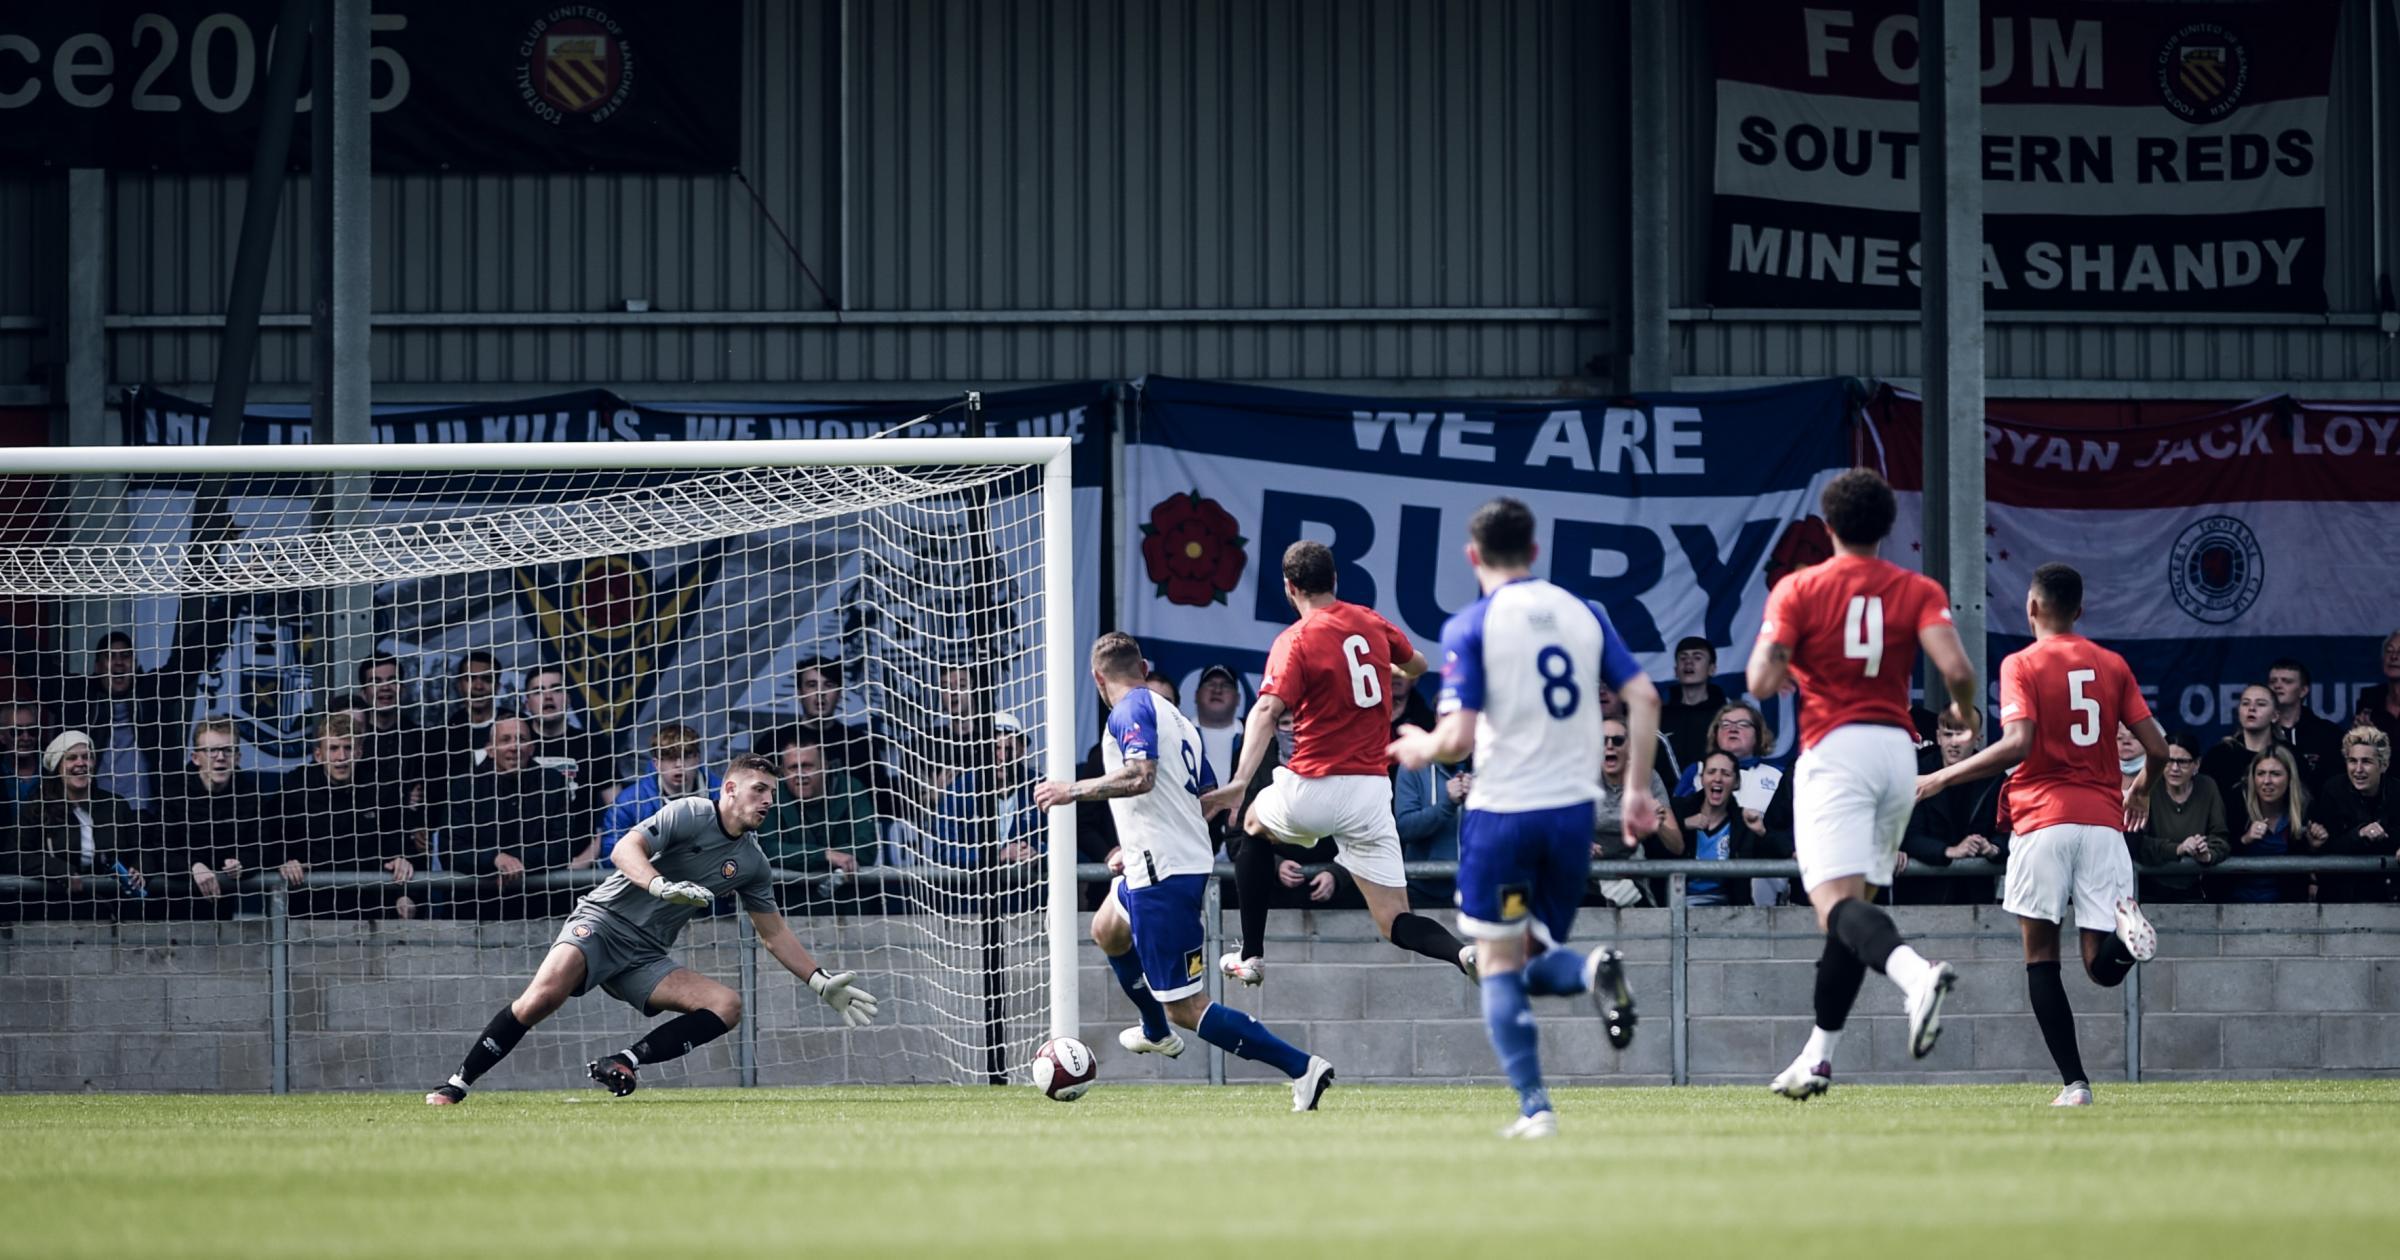 Bury AFC boss on side's pre-season progress after FC United draw